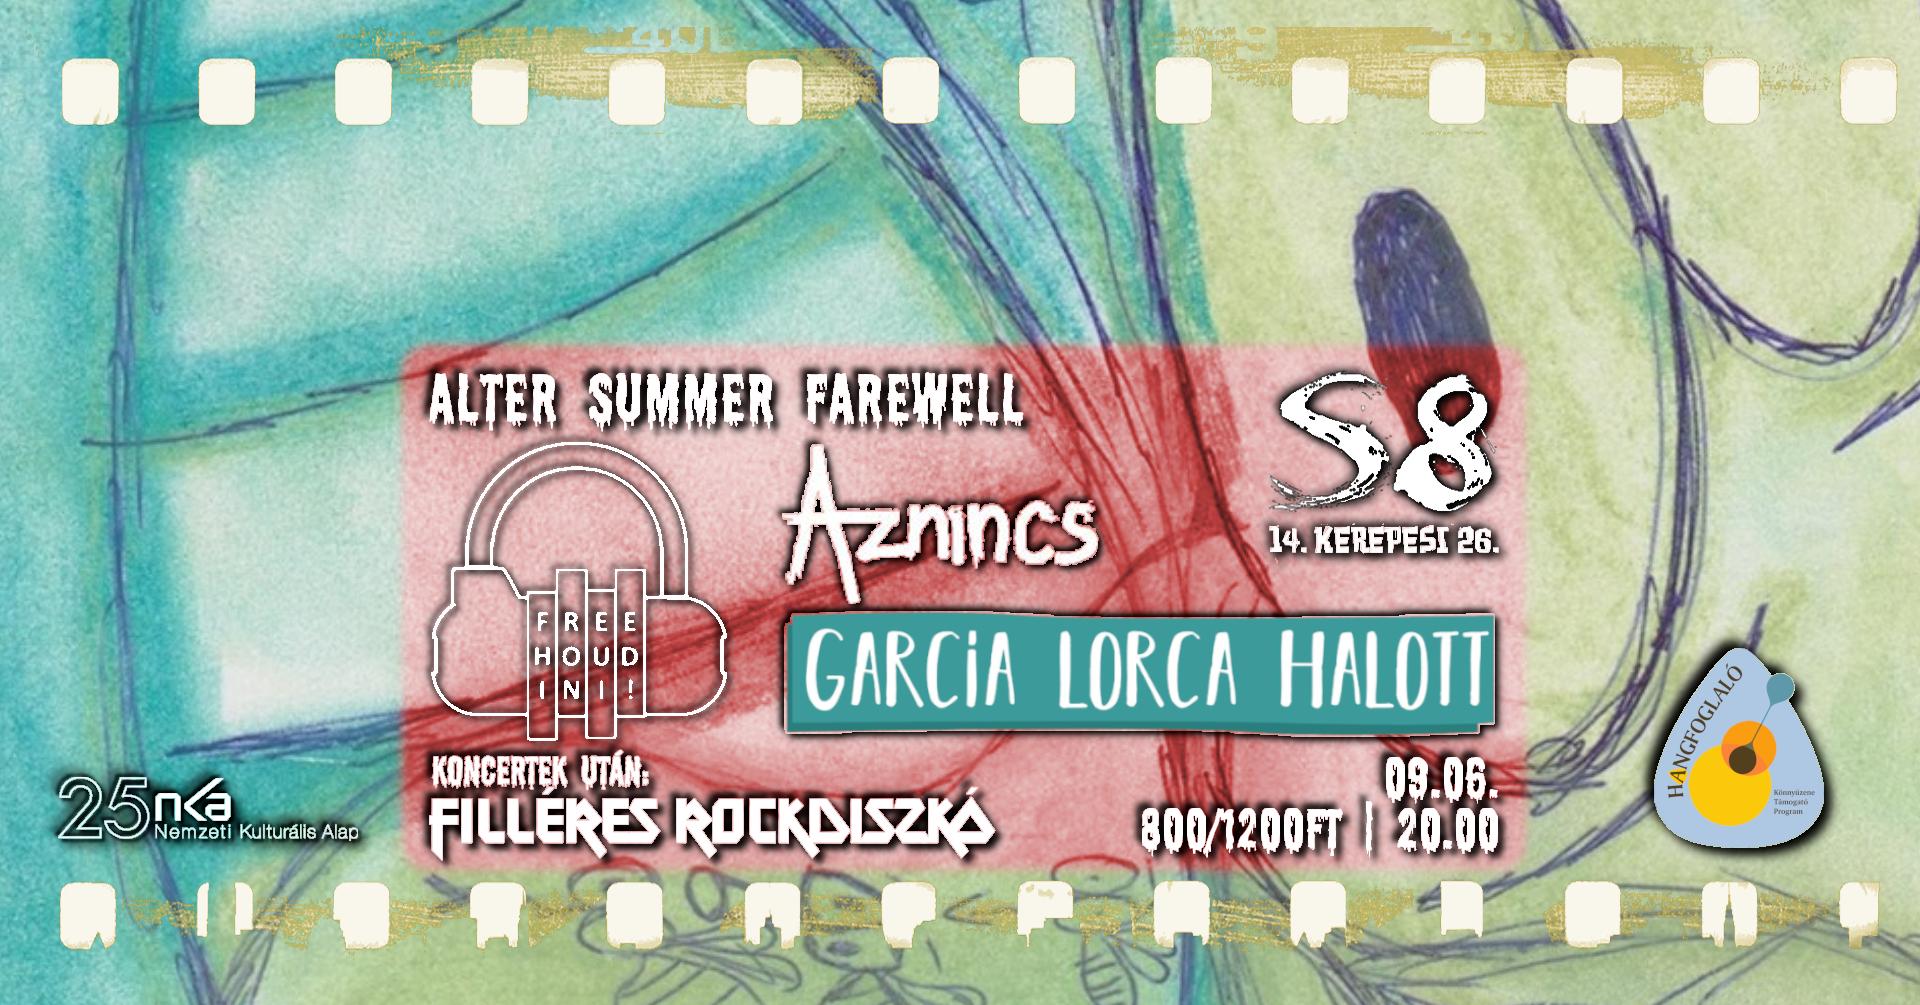 Alter Summer Farewell - García Lorca Halott I Free Houdini I Aznincs